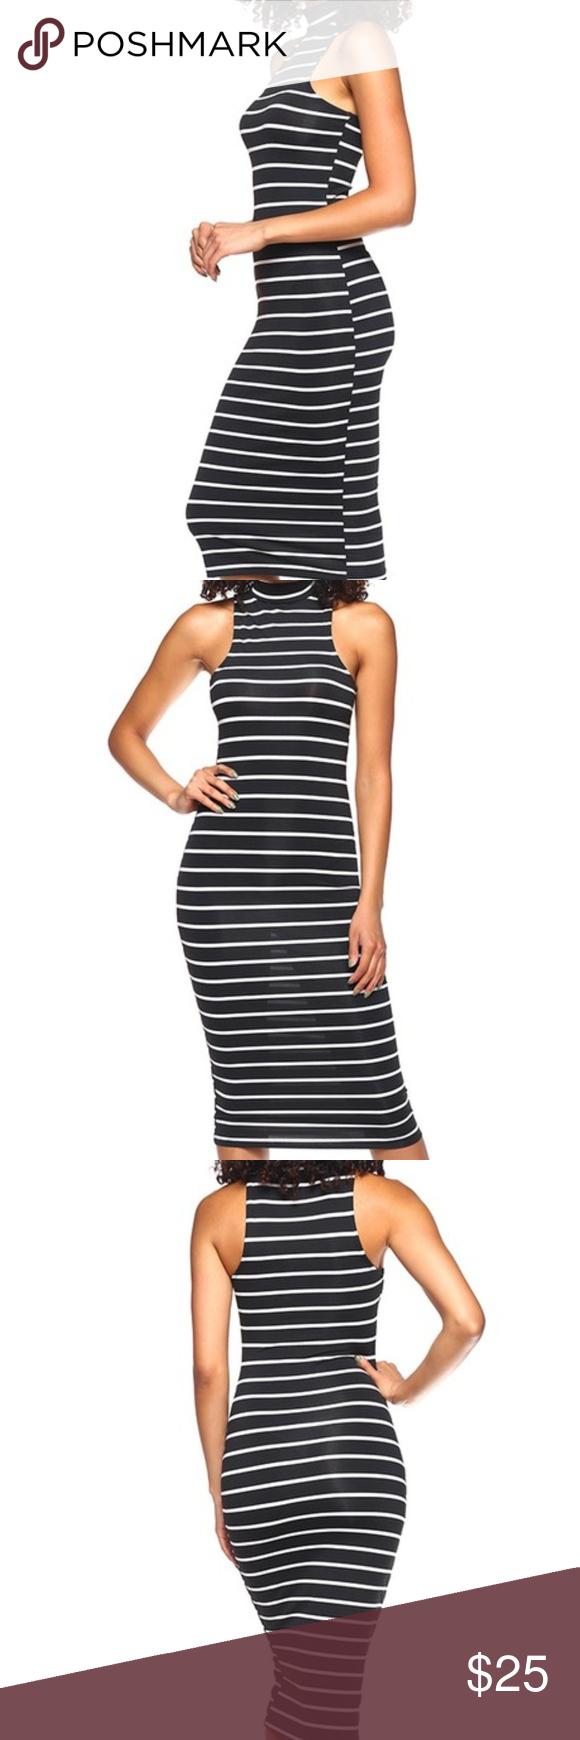 Bodycon Dress Black White Stripe Midi Posh Dresses Striped Bodycon Midi Dress Dresses [ 1740 x 580 Pixel ]